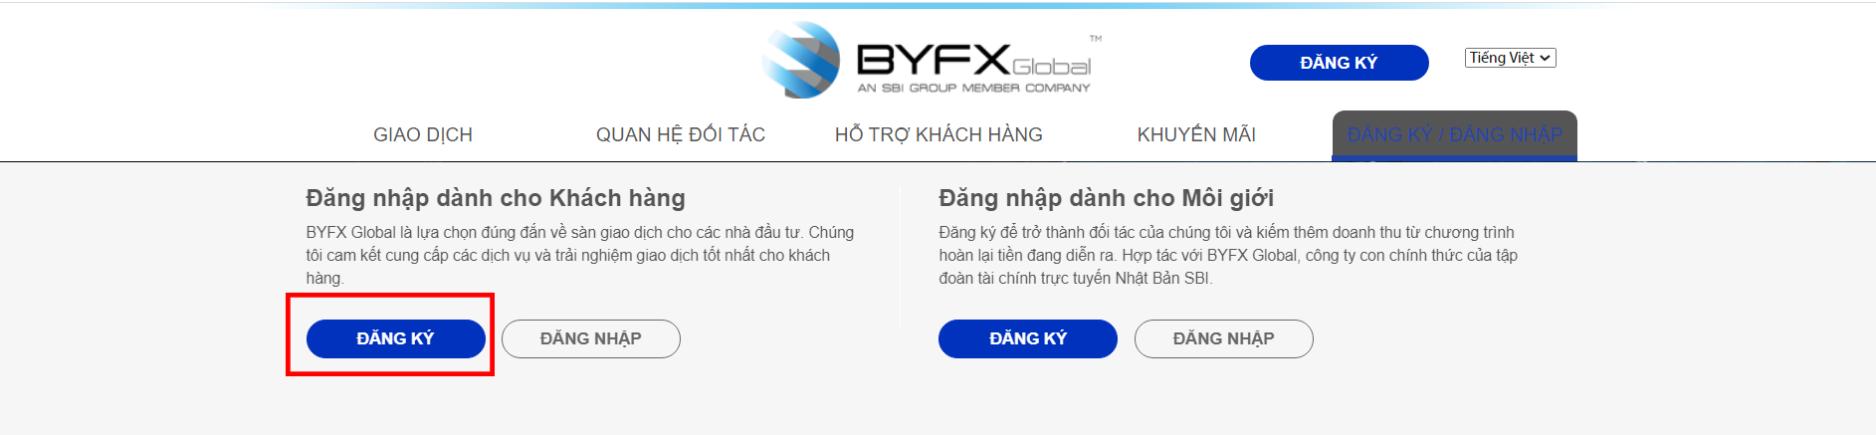 tao tai khoan tren san BYFX